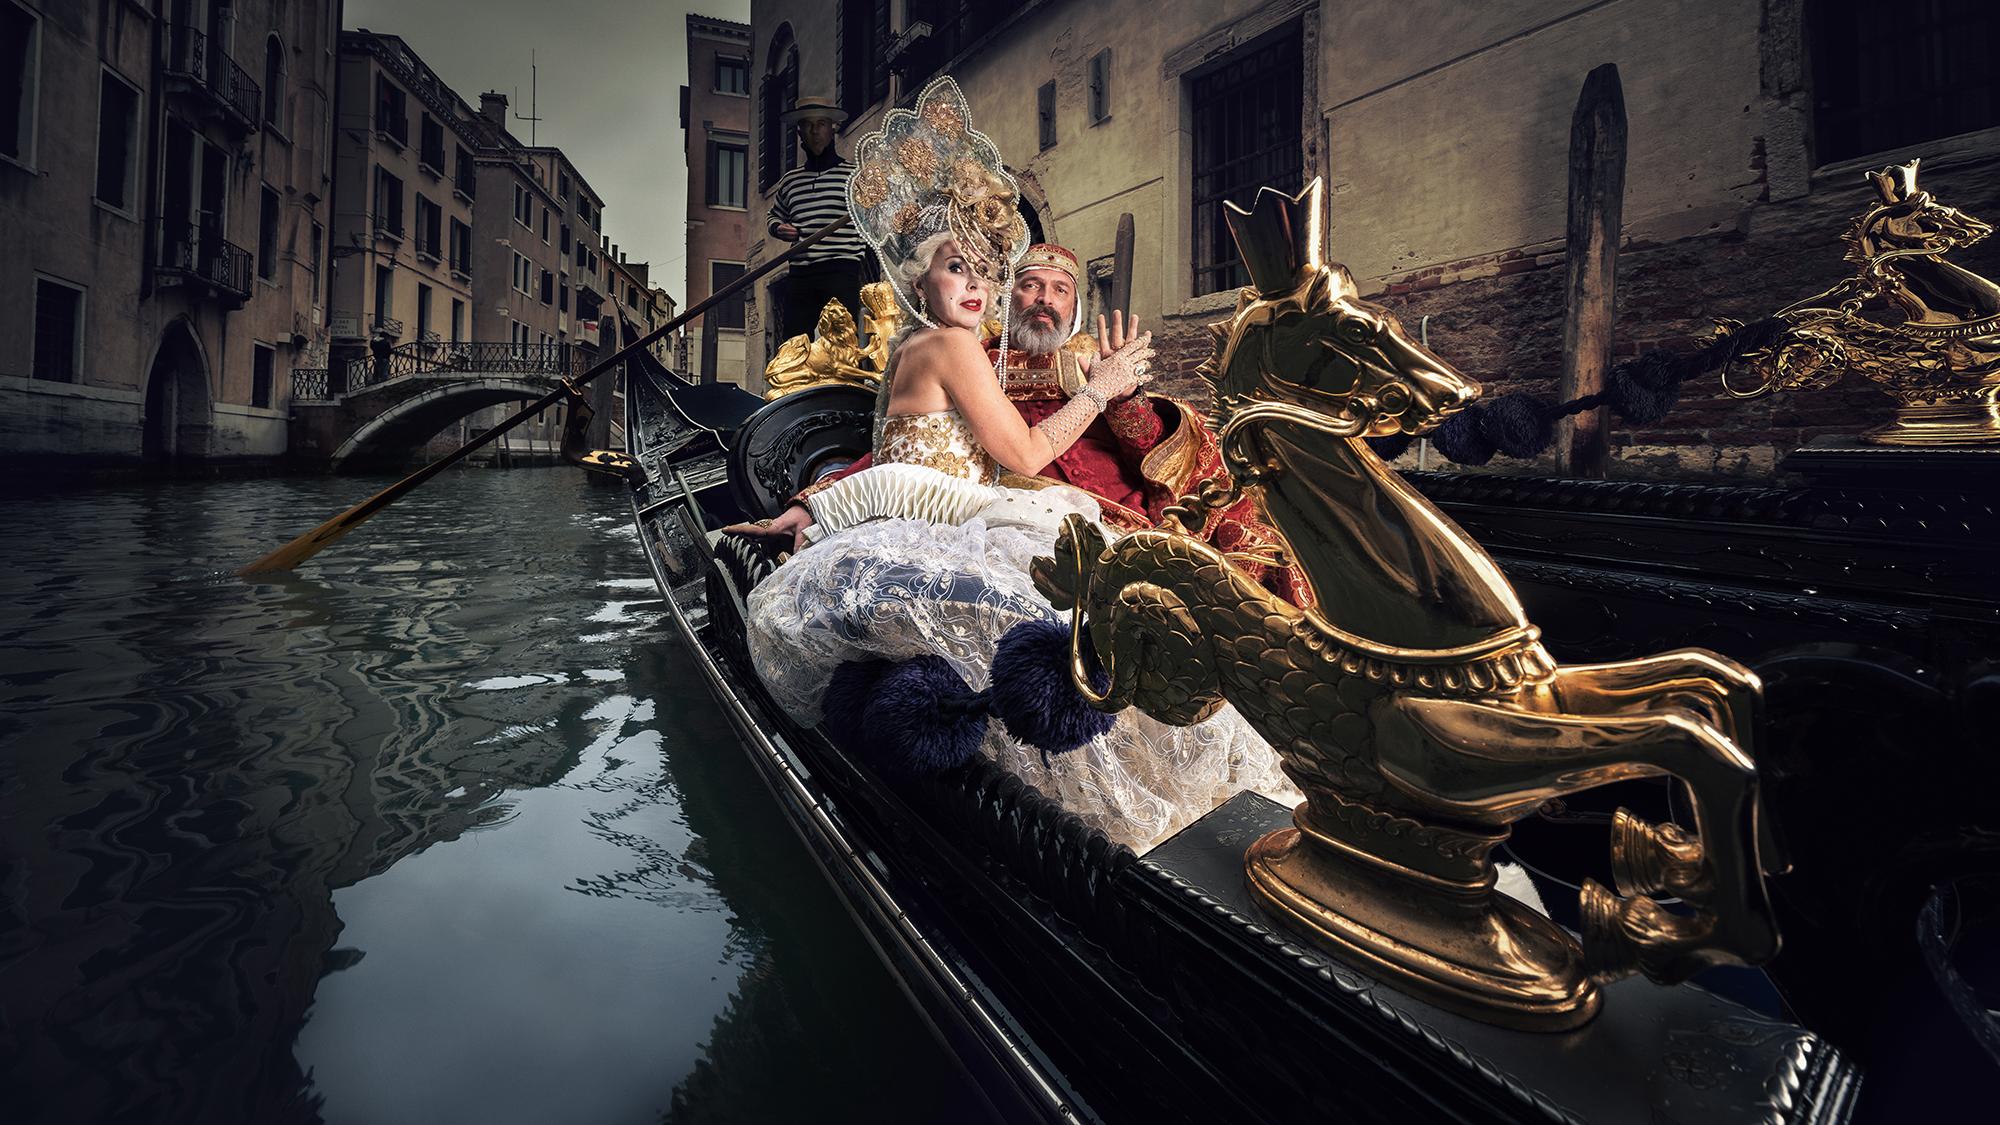 Faces of Venice